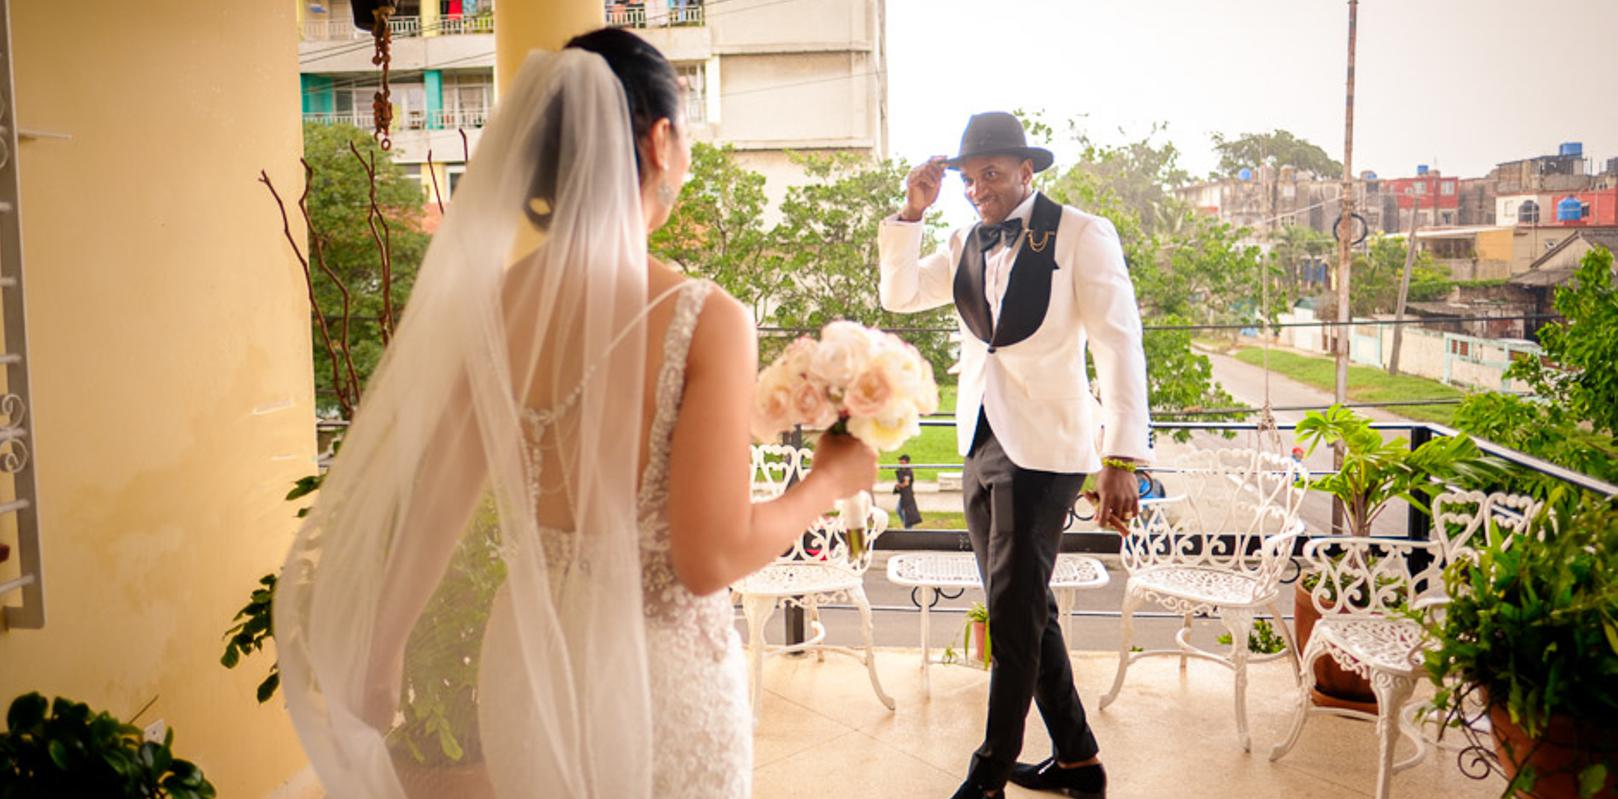 bodas-sin-clasificar-sin-tema-cuba-41091.jpg